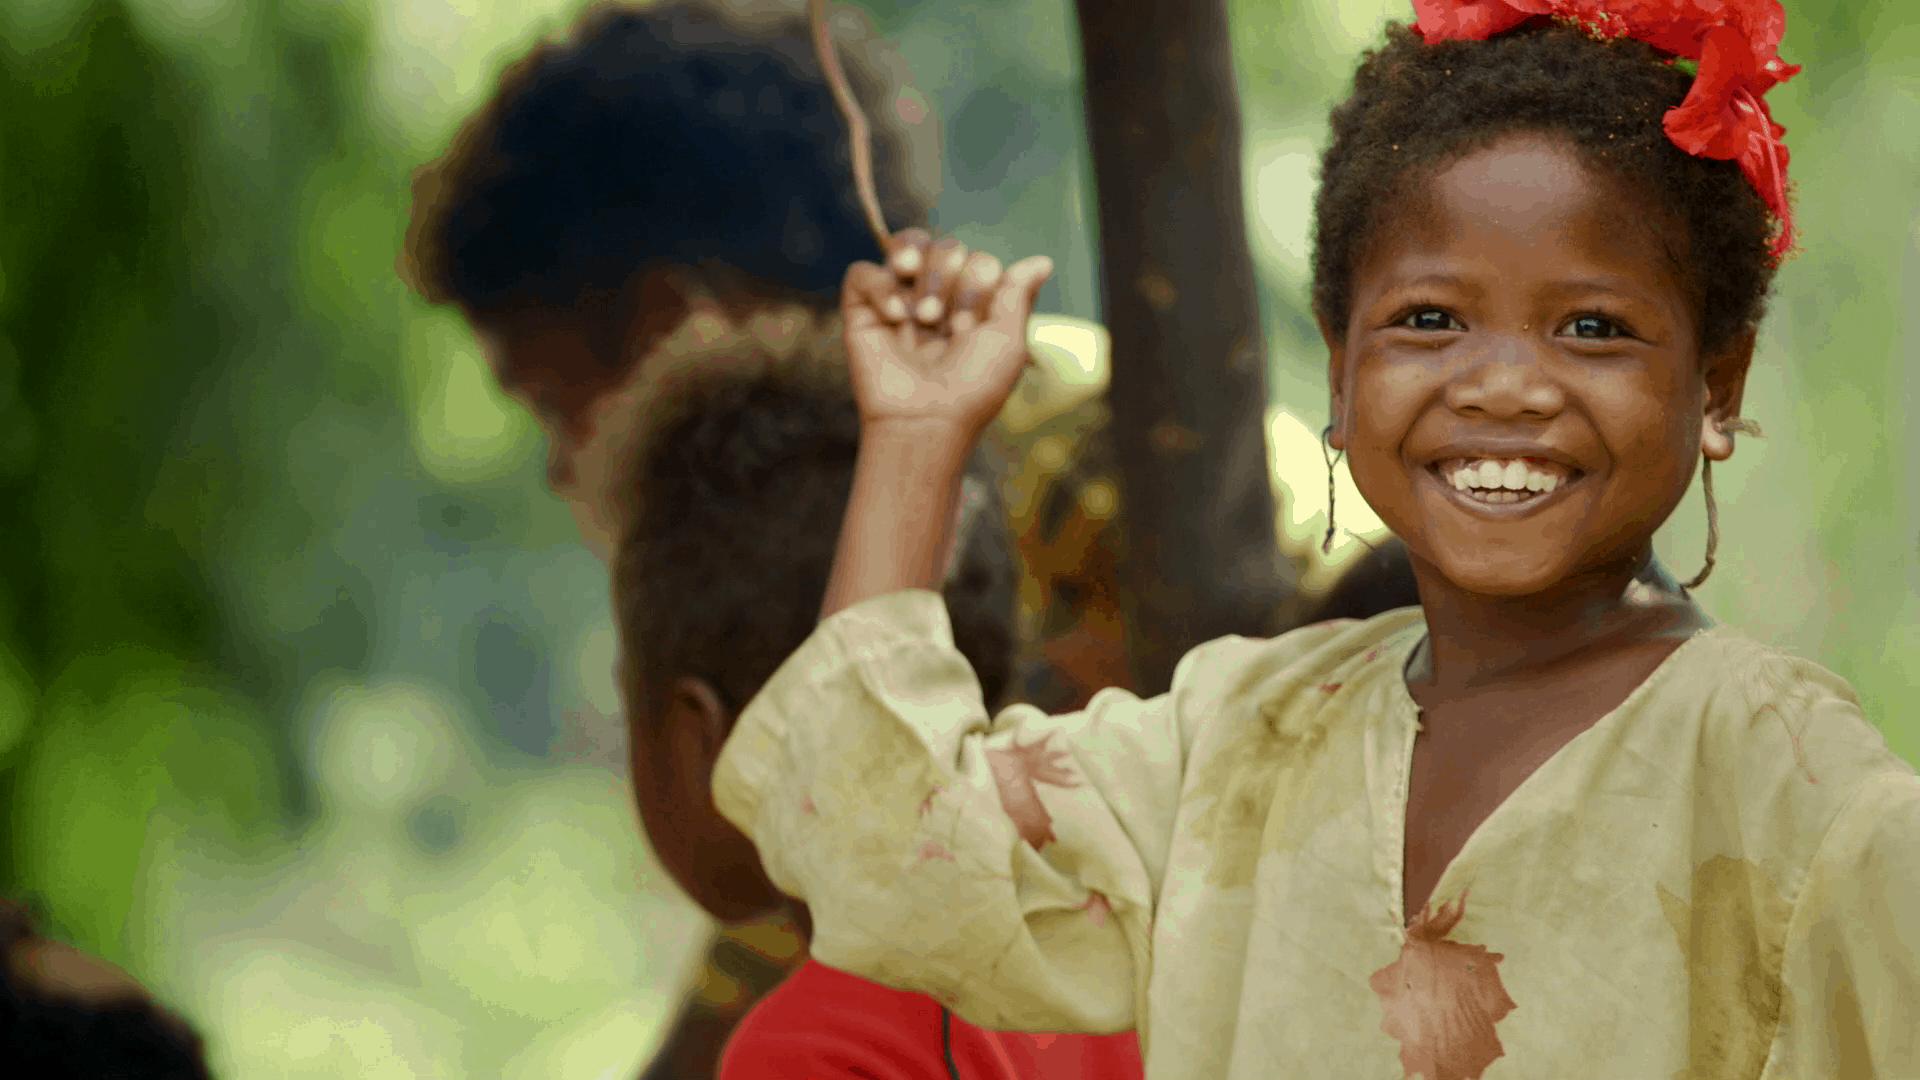 Orang asli child, Malaysia